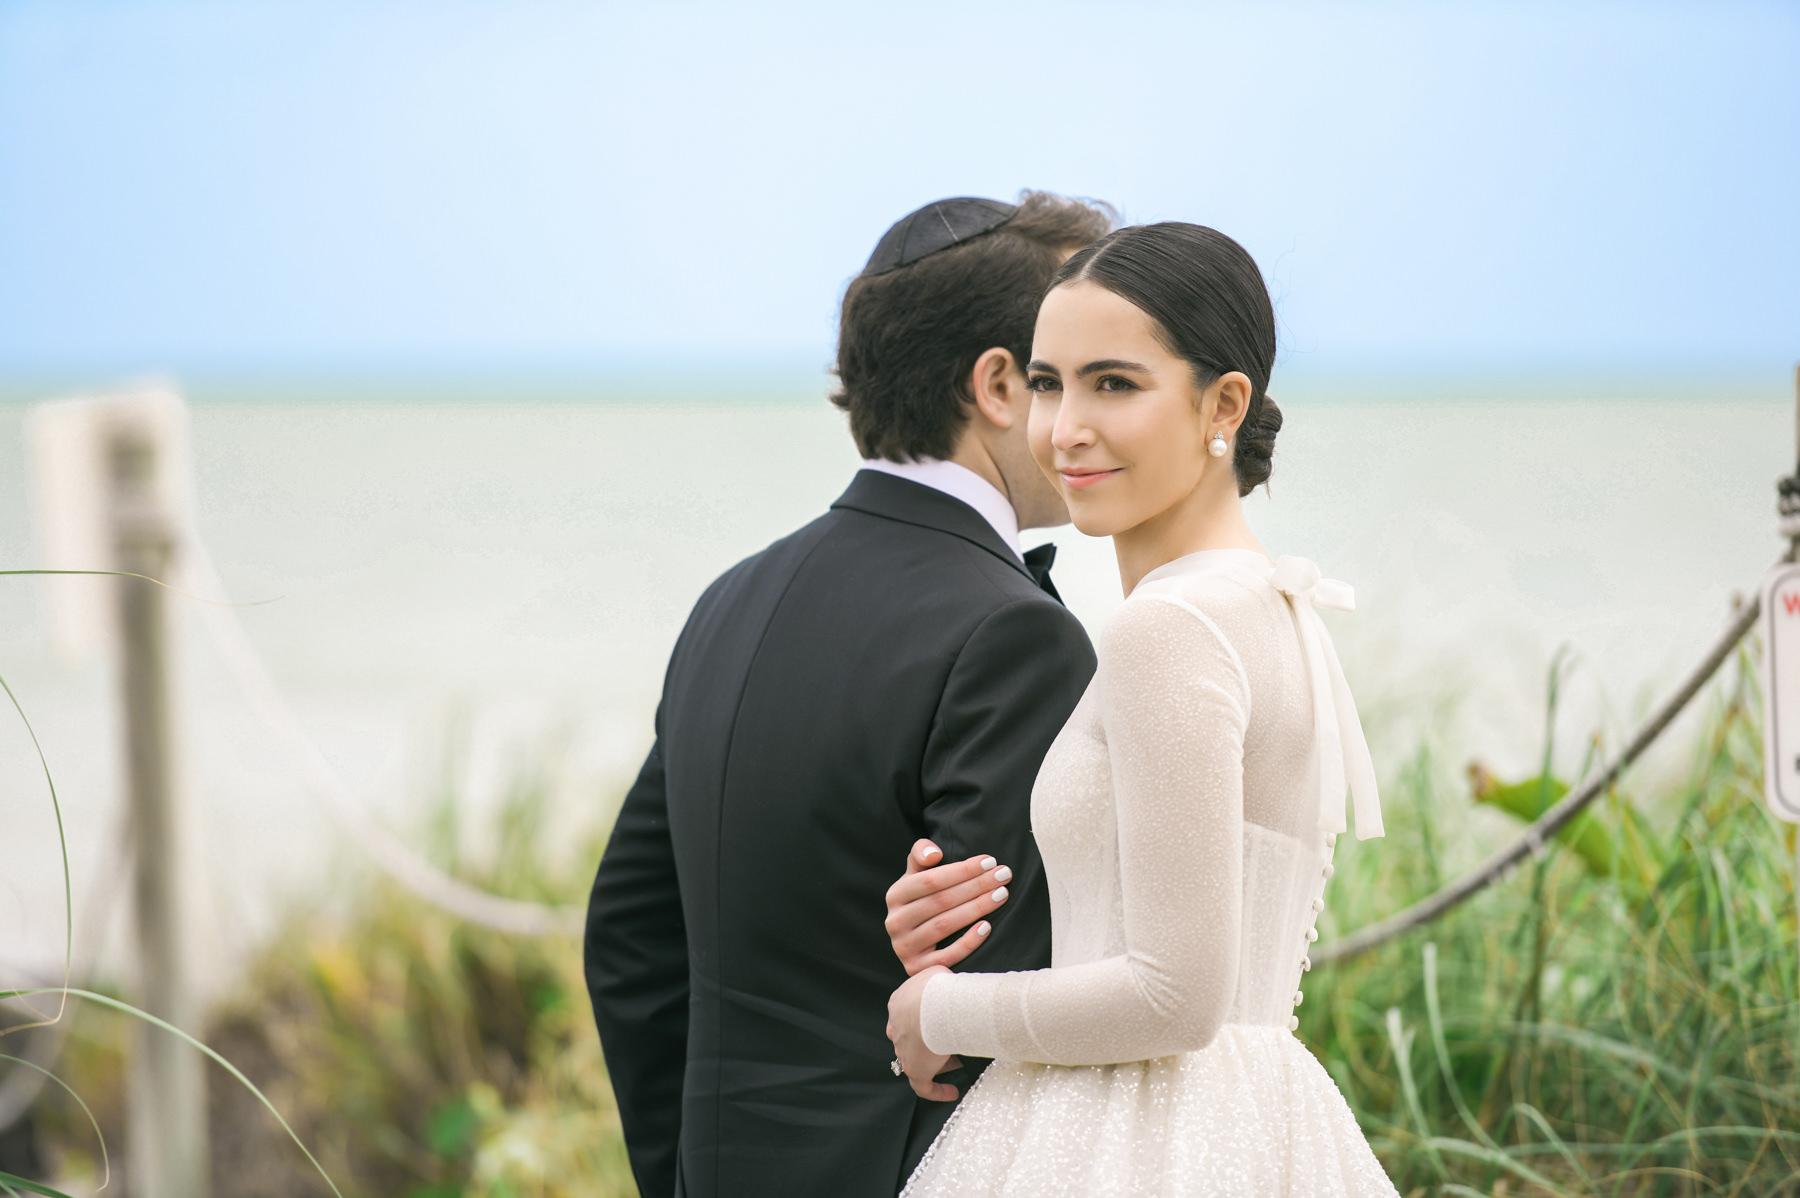 Enchanted Garden Wedding at The Ritz Carlton, Key Biscayne